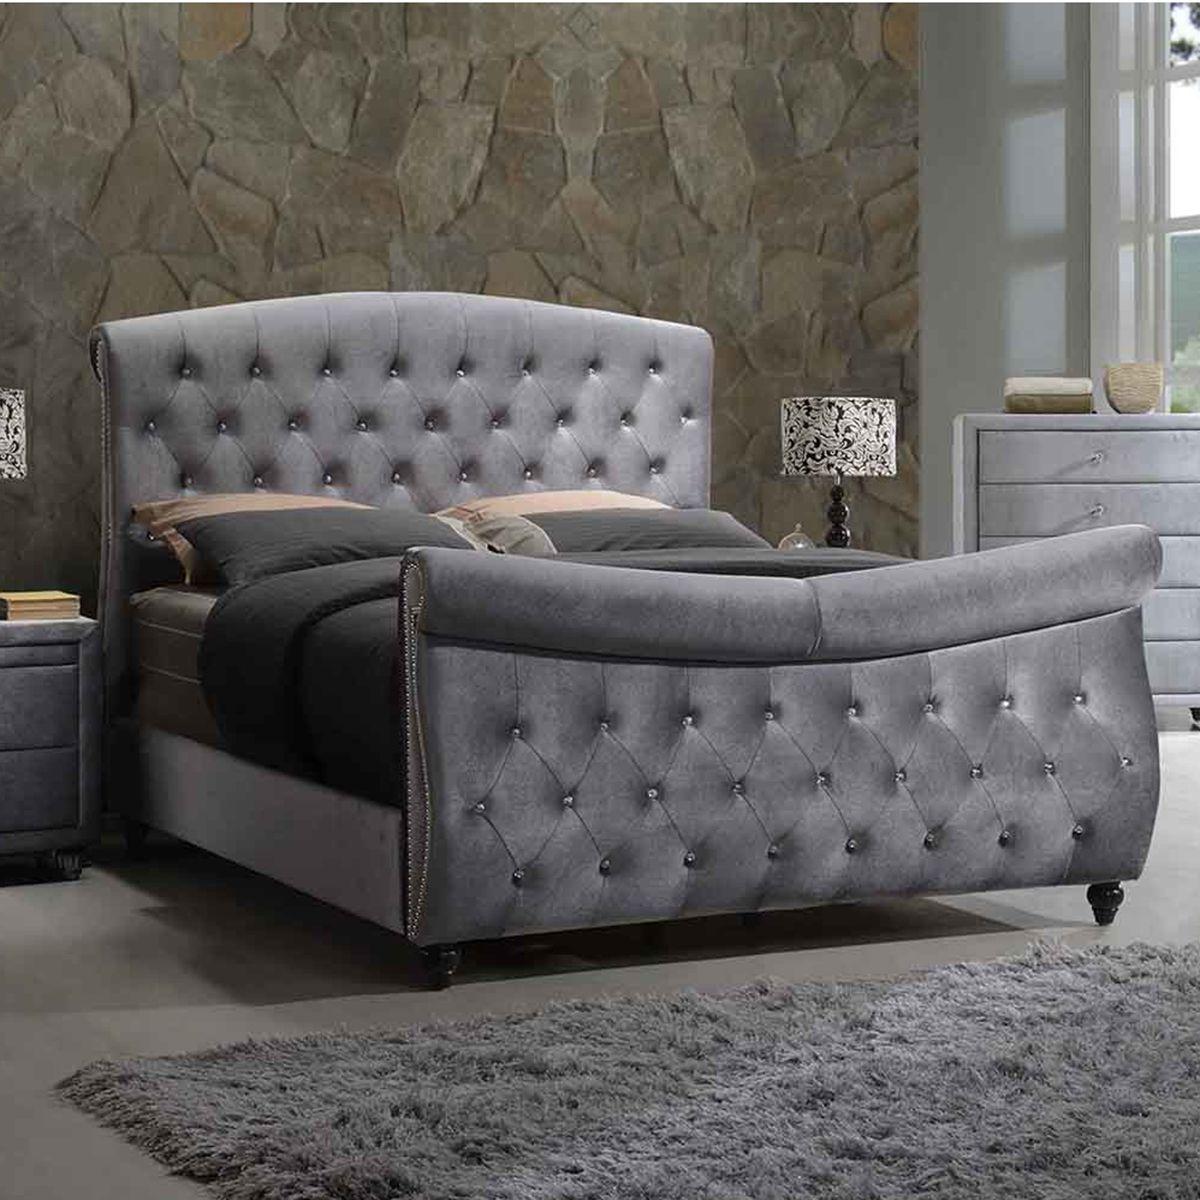 Meridian Furniture Hudson Grey Velvet King Sleigh Bed Crystal Tufted Headboard Footboard Hudson-Sleigh-K at Dynamic Home Decor